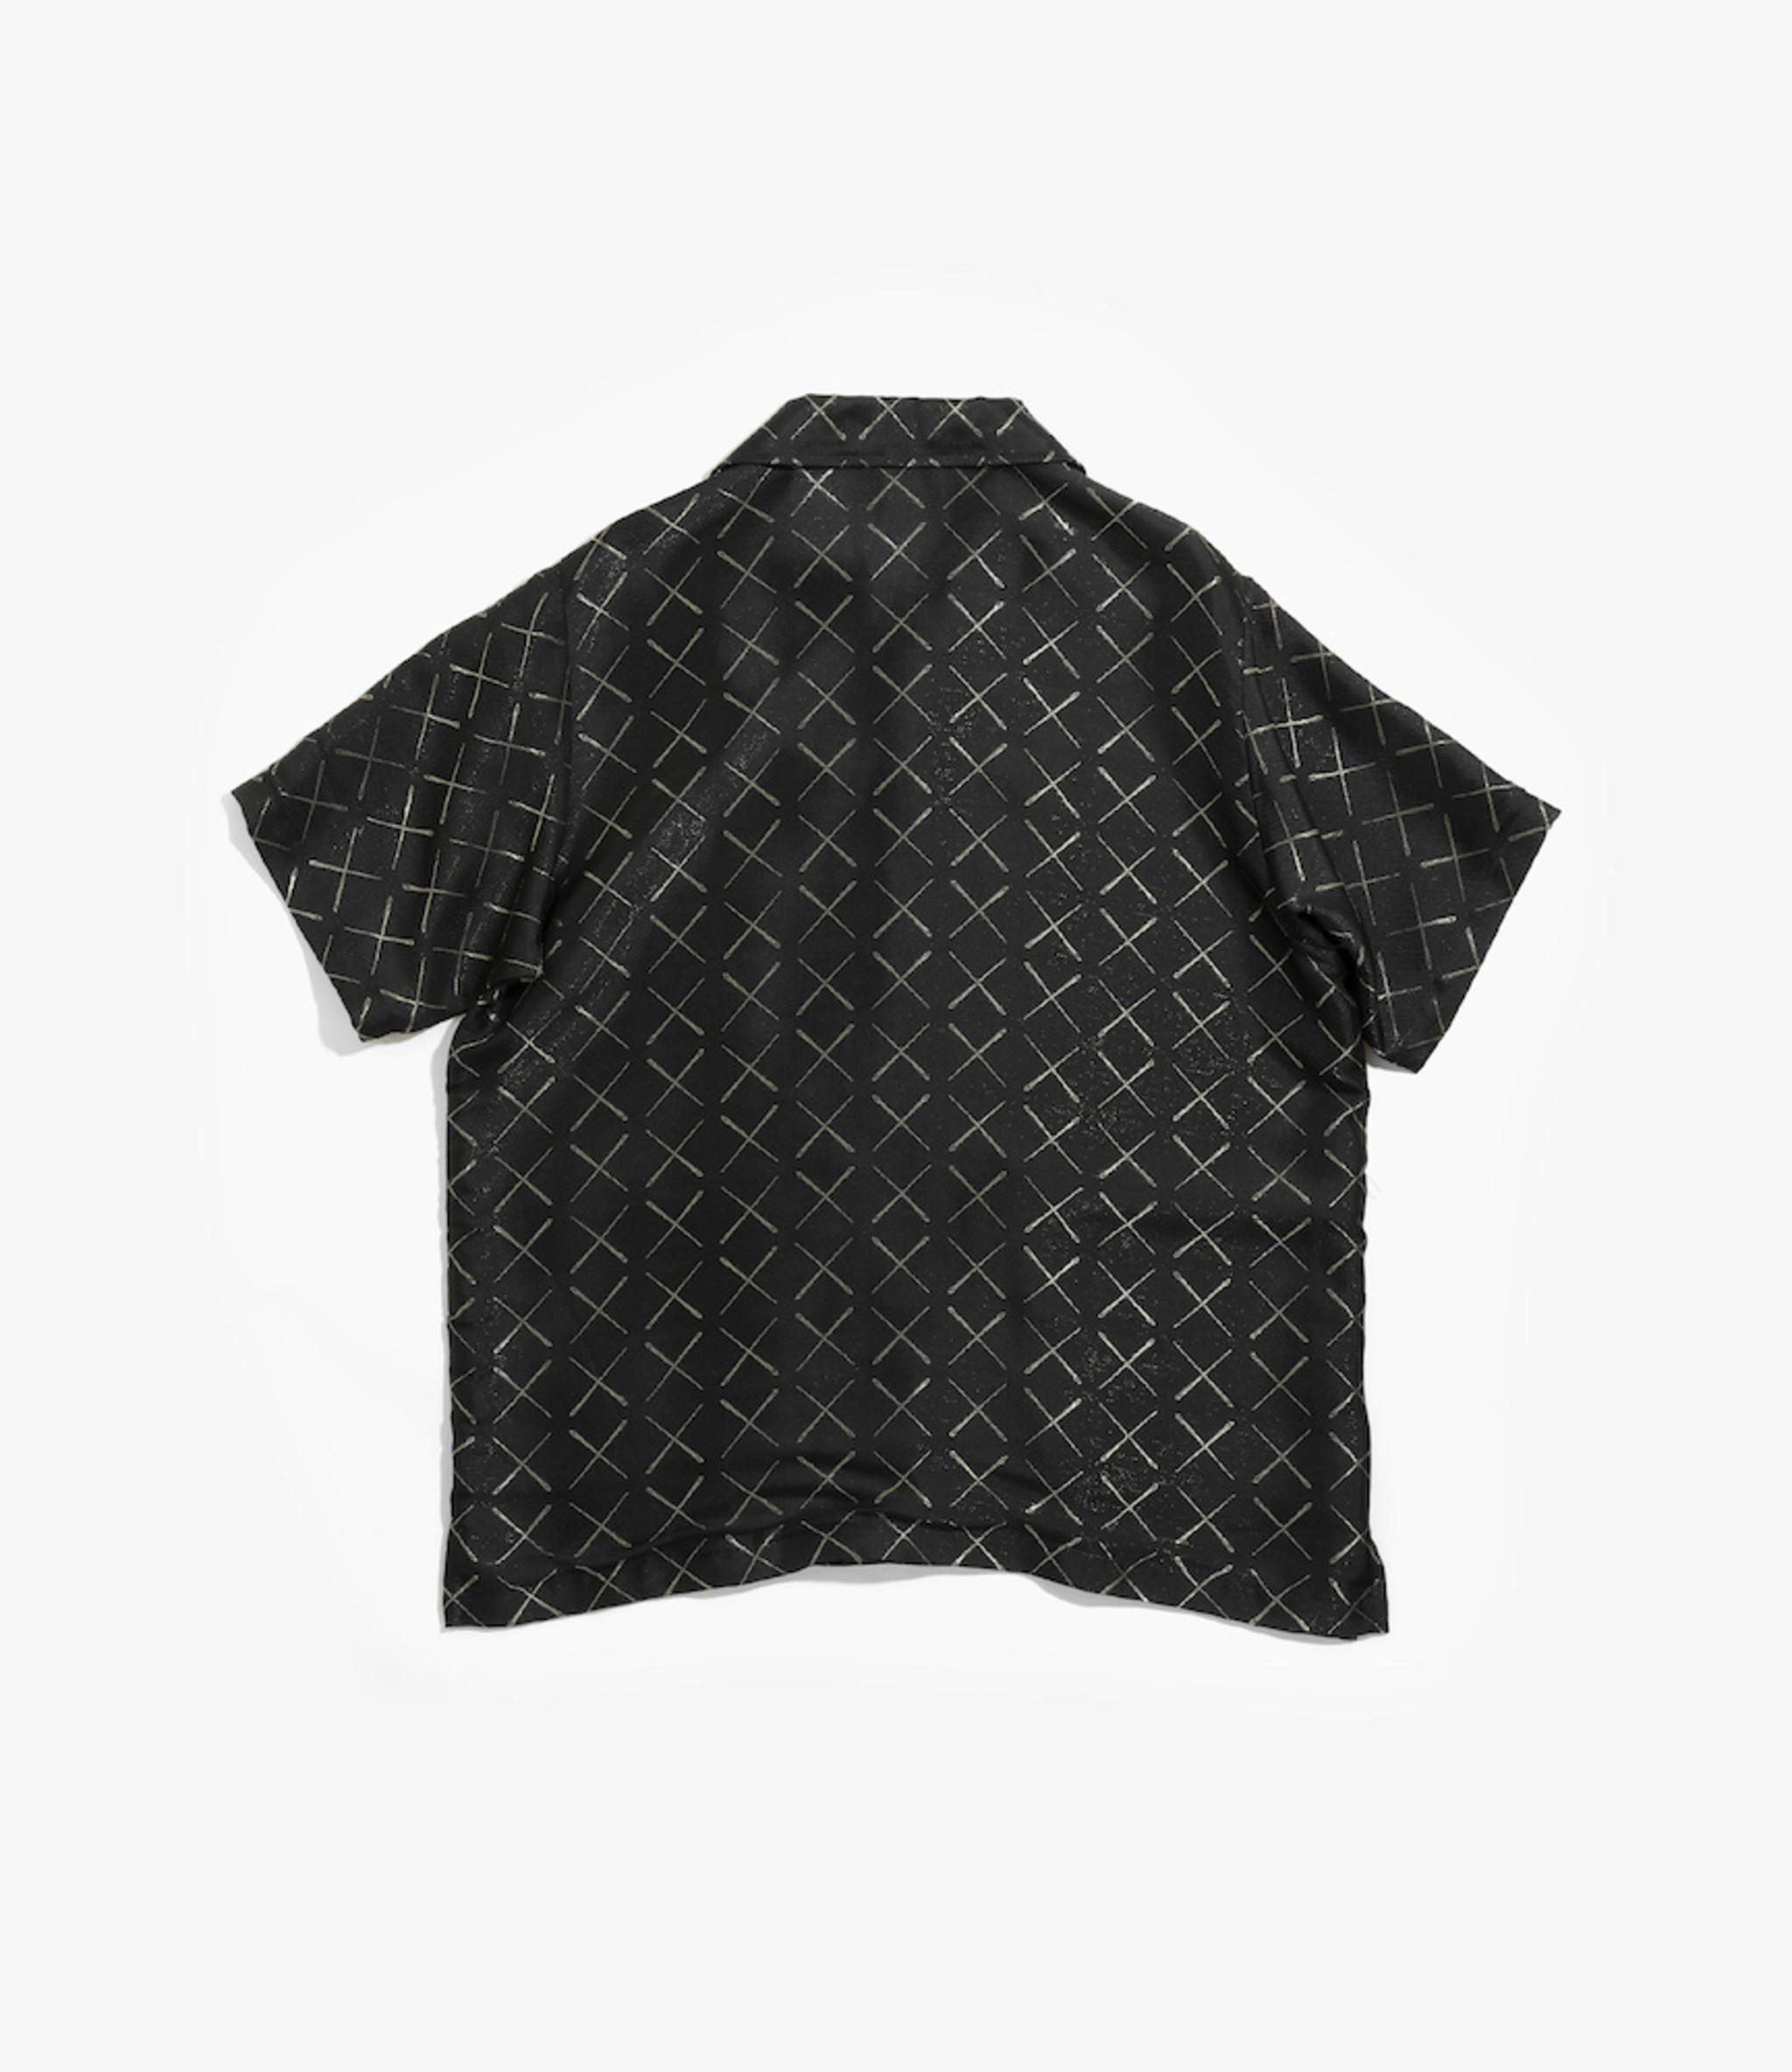 Needles Cabana Shirt - Cu/R/Pe Needles Jacquard - Black